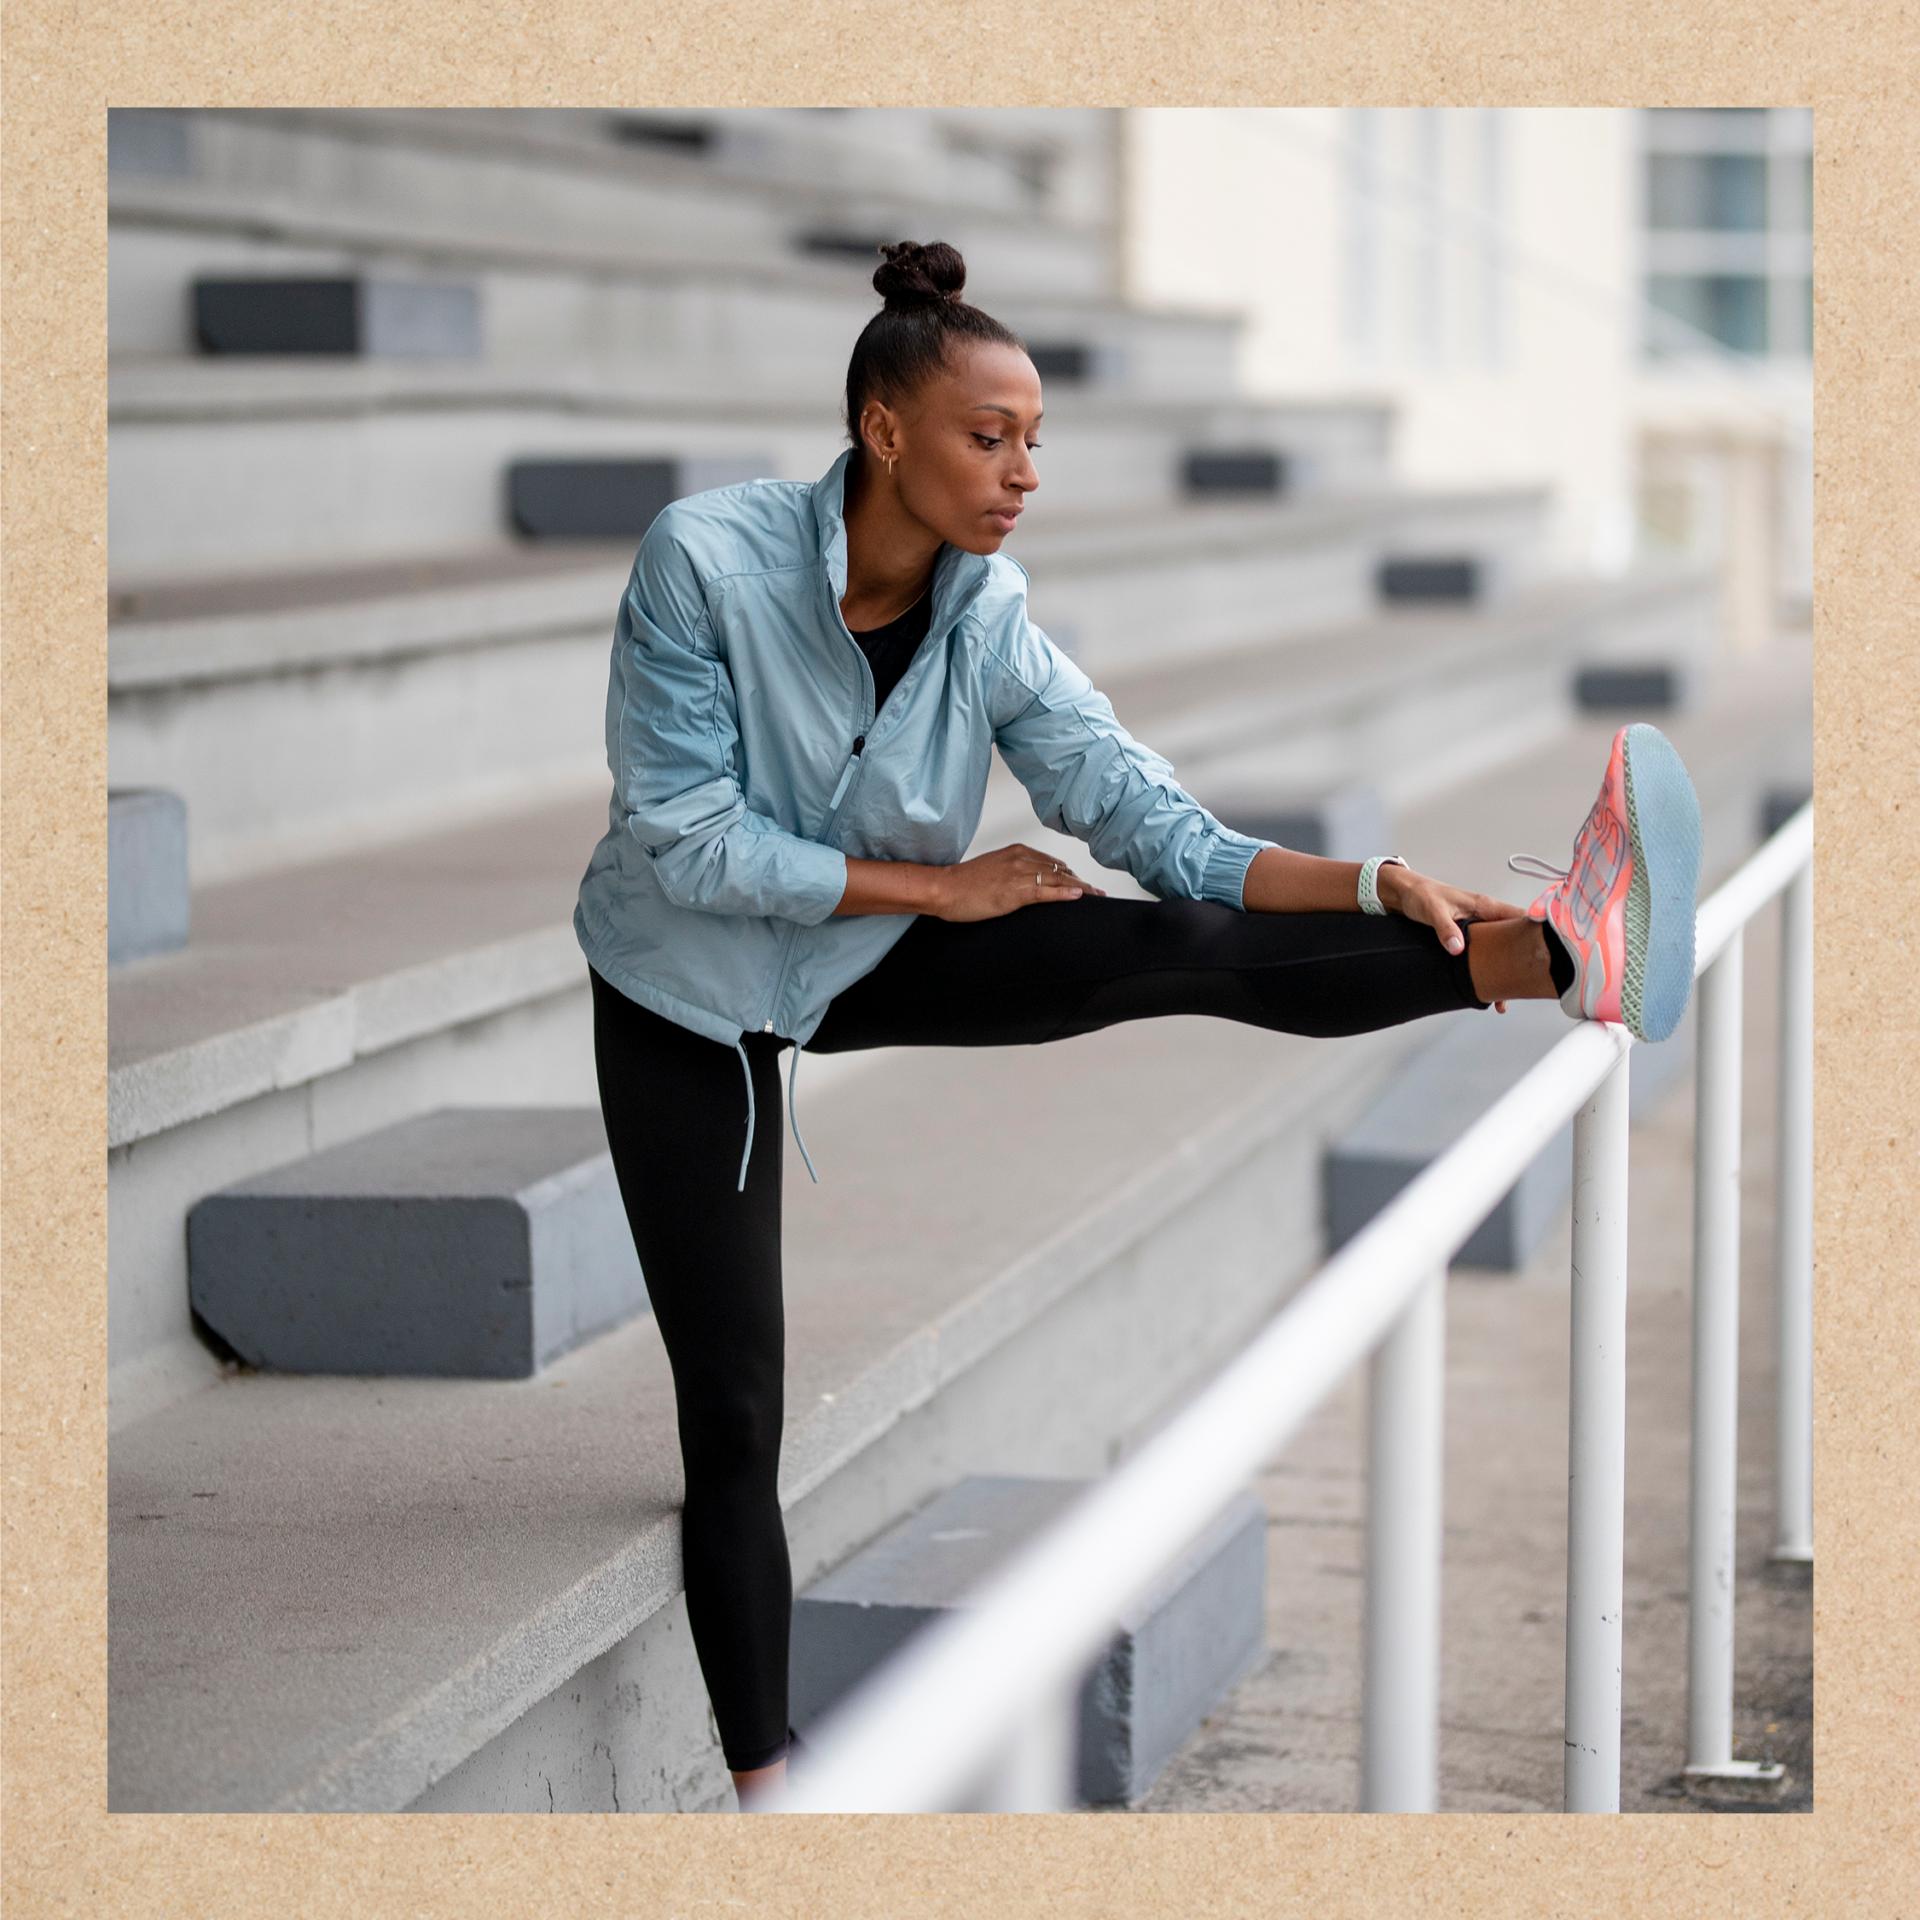 Imagen de Ana Peleteiro realizando ejercicio para una vida sana